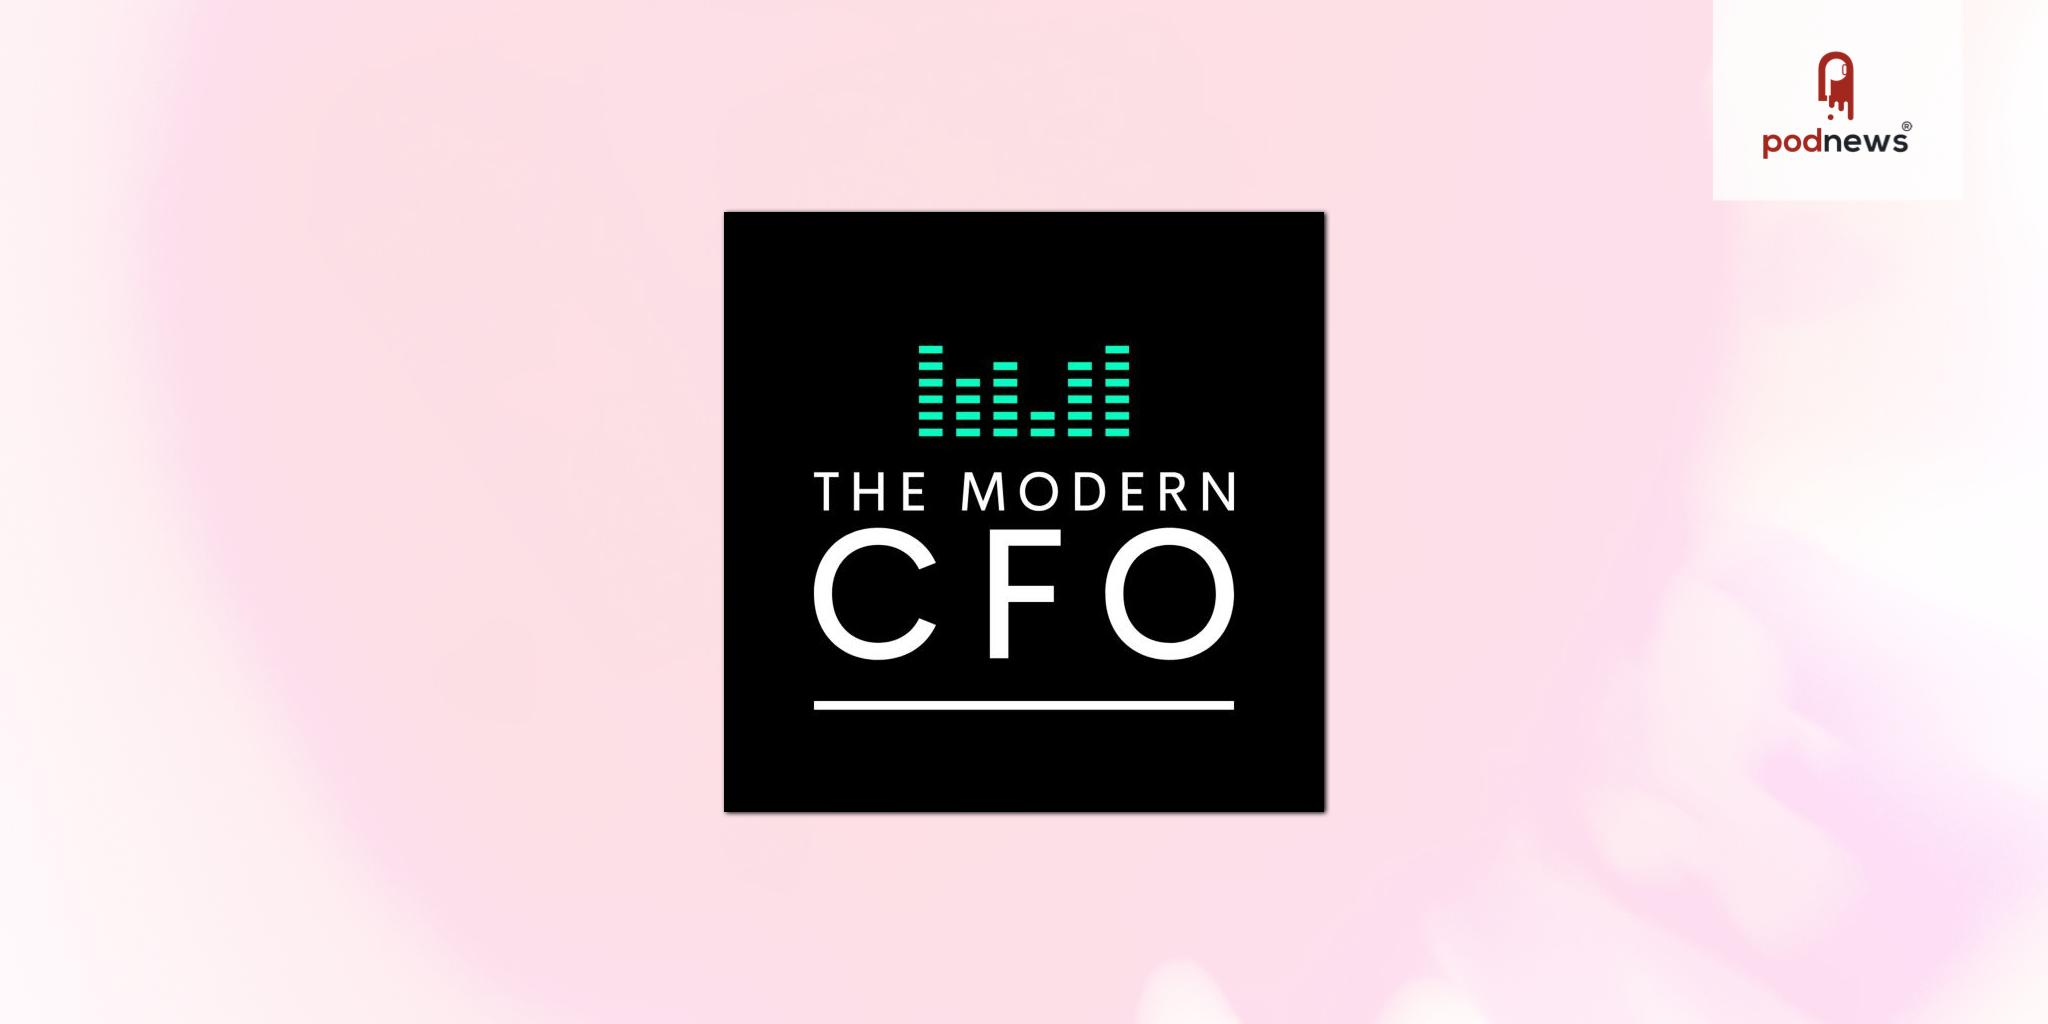 Top FinTech Platform Nth Round Launches The Modern CFO